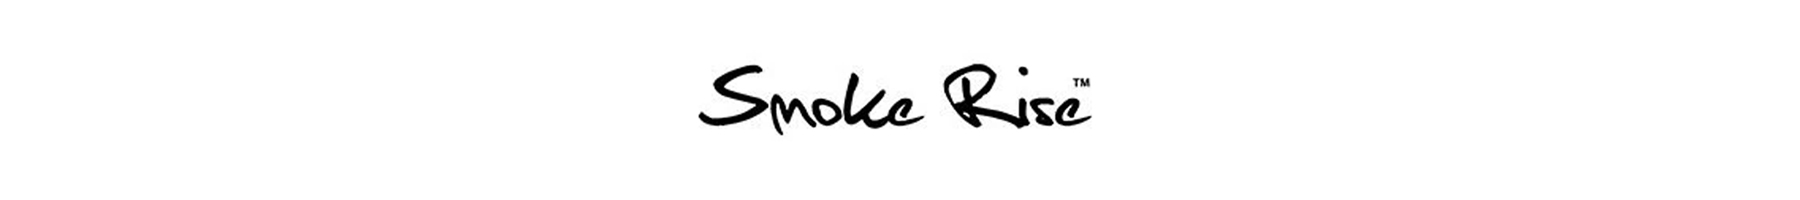 DrJays.com - Smoke Rise